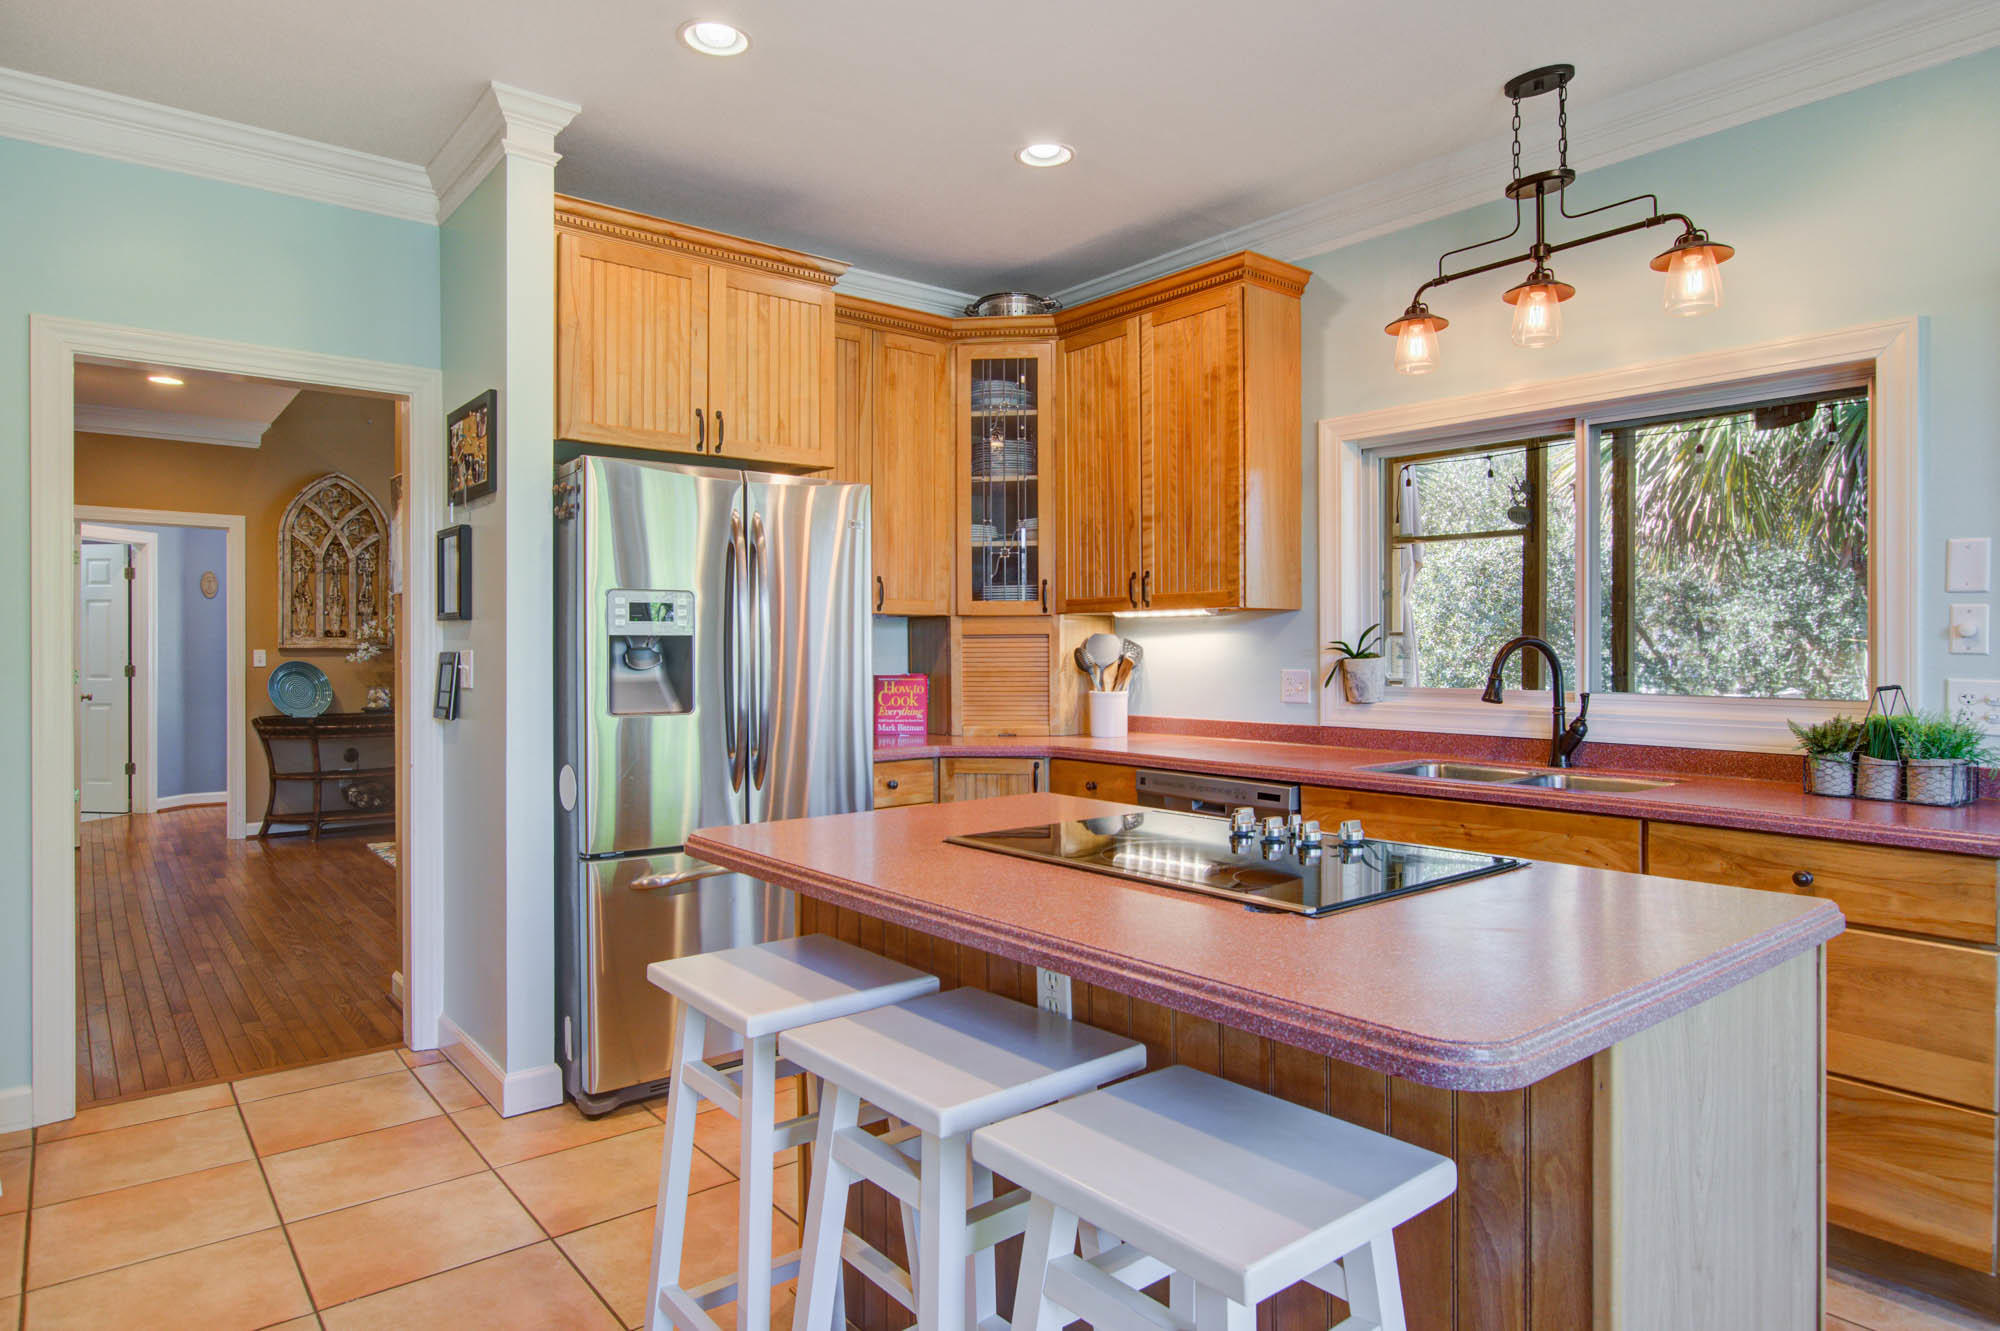 St Thomas Point Homes For Sale - 307 Jamesbury, Charleston, SC - 34